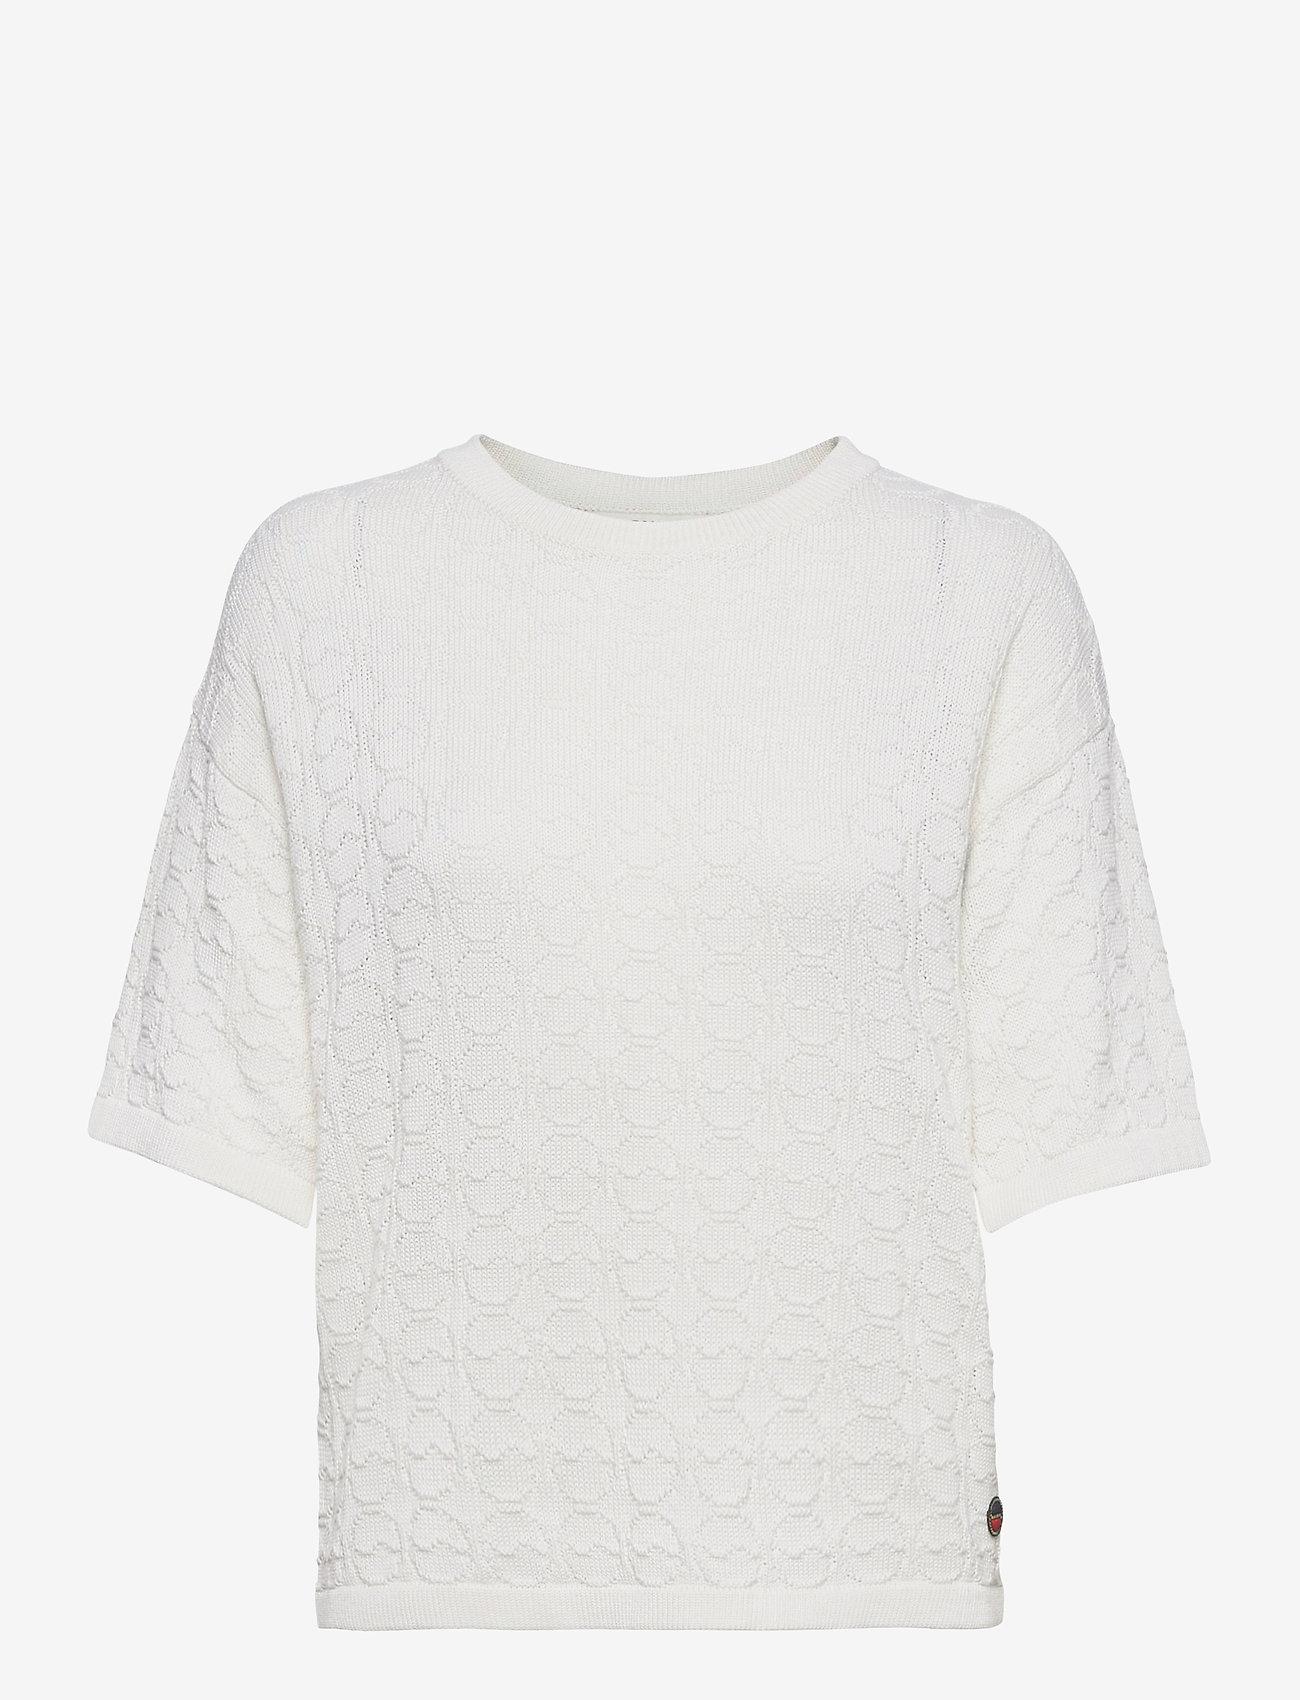 BUSNEL - Christelle top - gebreide t-shirts - white - 0